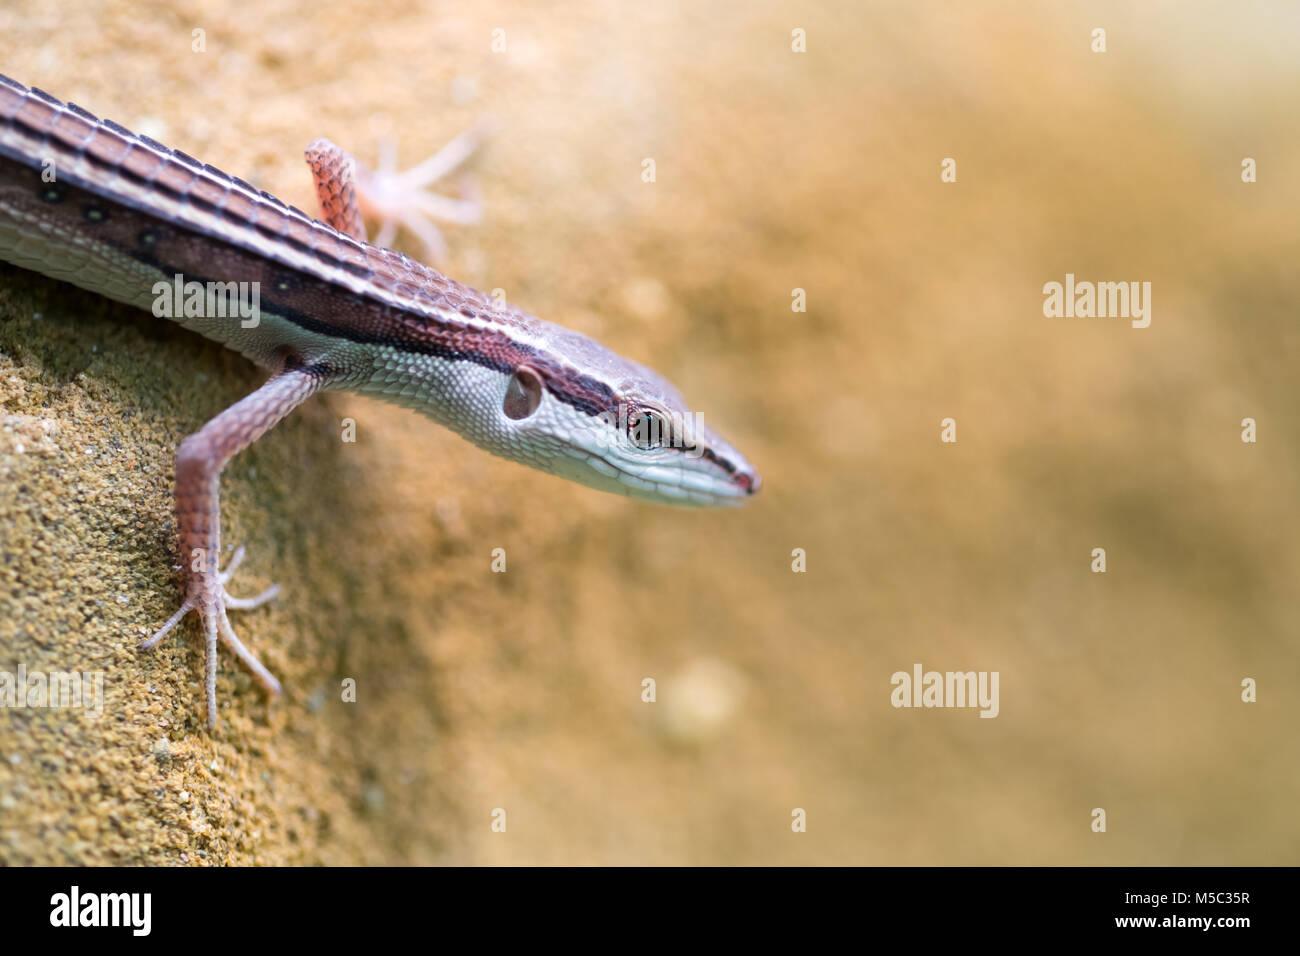 Popular pet gecko, gecko a night active lizard - Stock Image